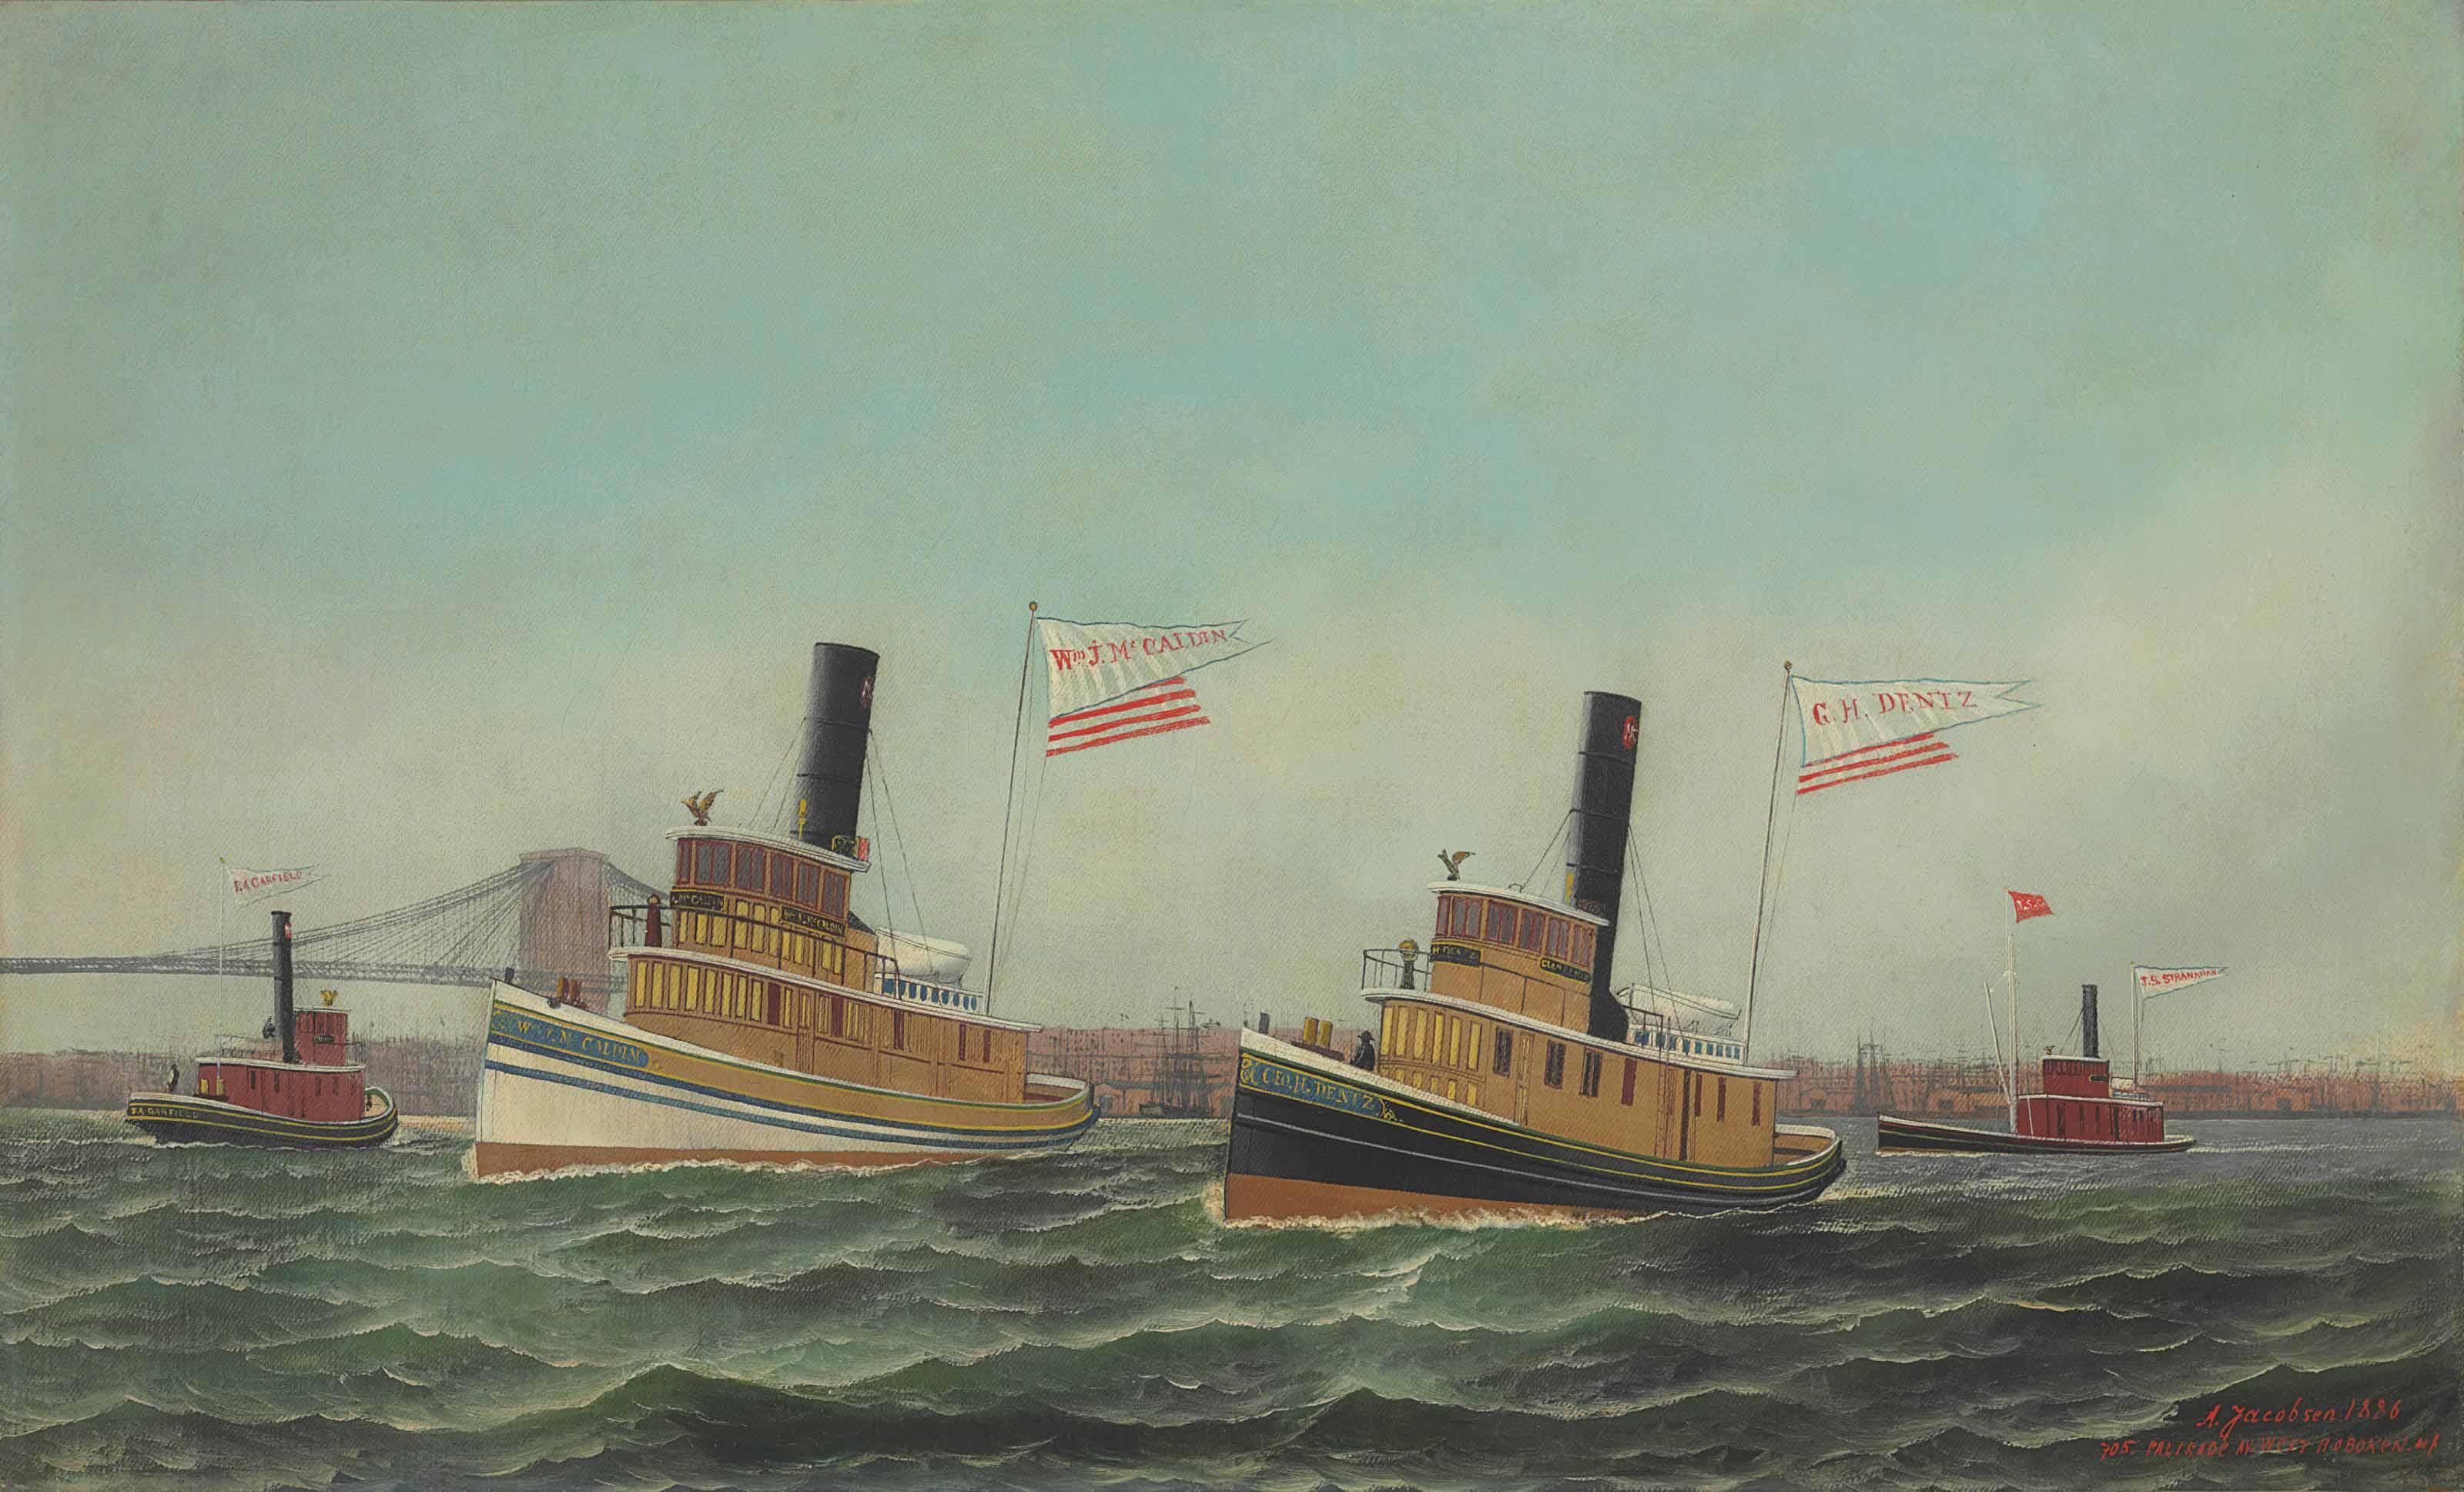 The Tugboats of WM. J. McCaldin, G.H. Dentz and J.S. Stranahan in the East River, South of the Brooklyn Bridge